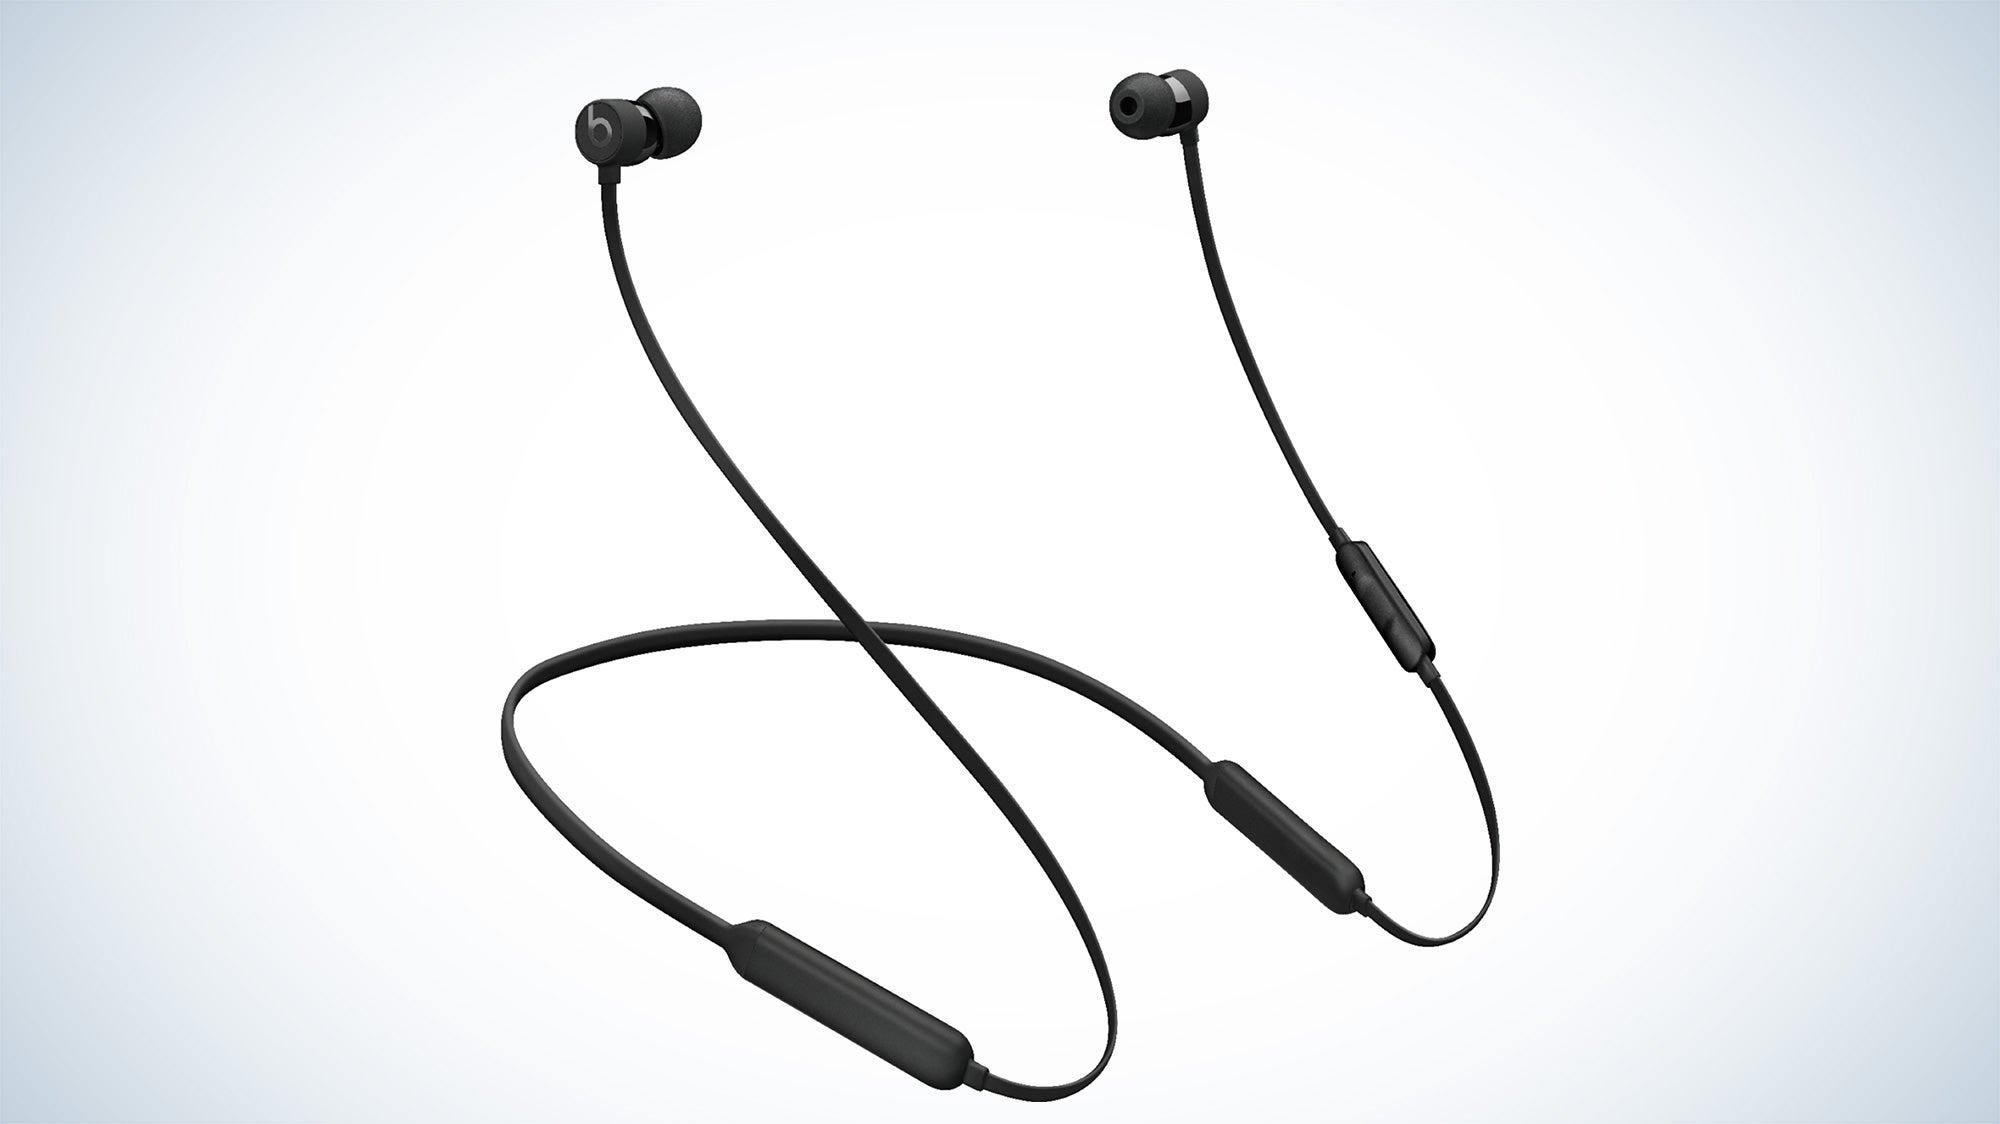 BeatsX headphones